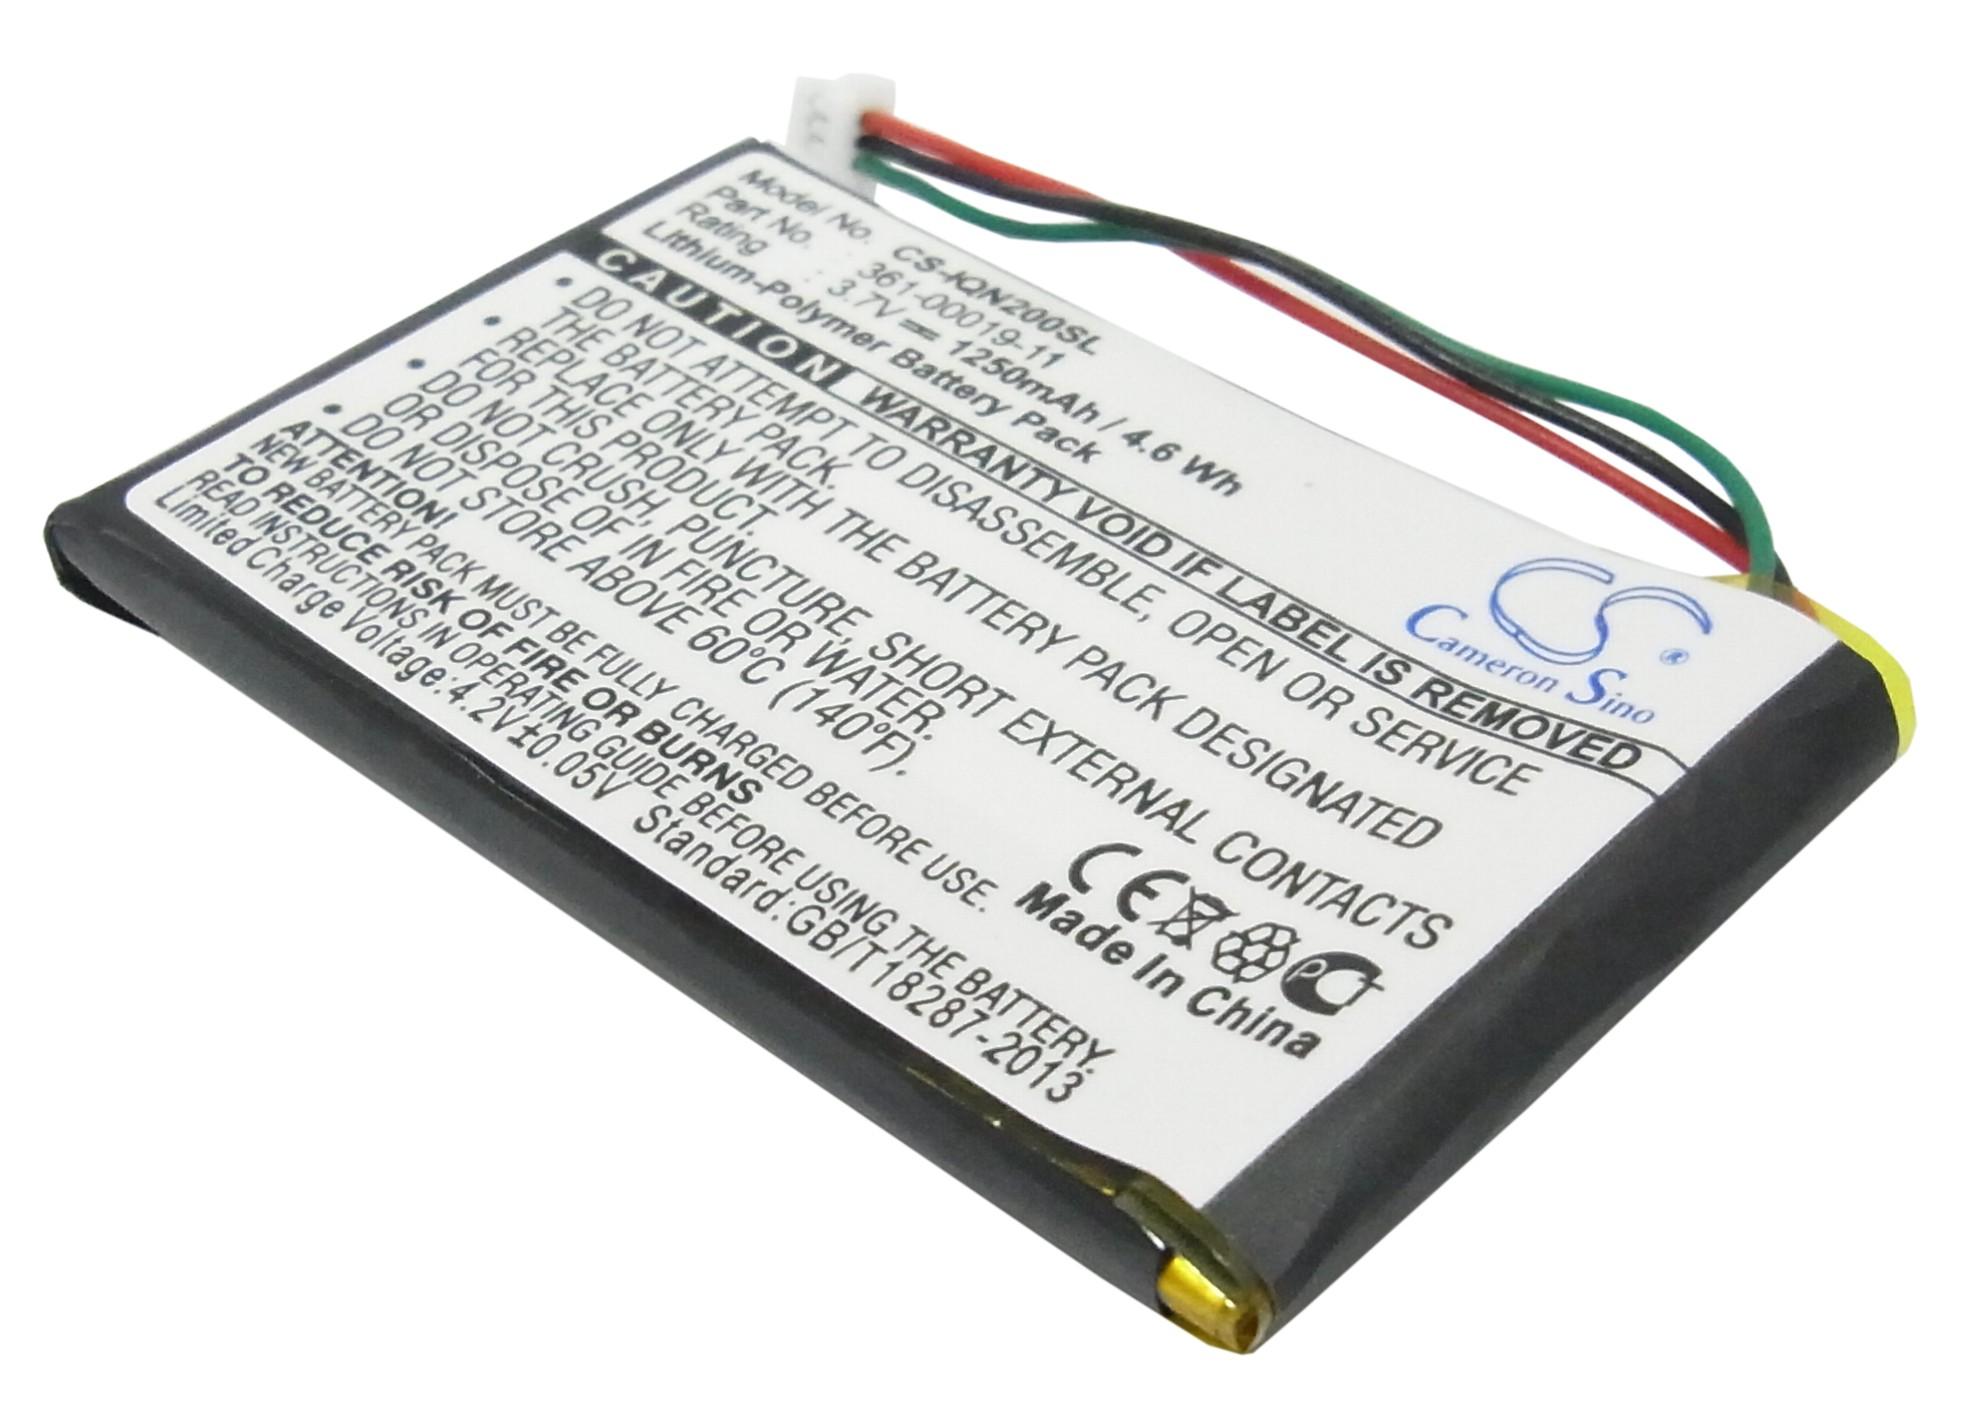 Battery for Garmin Nuvi 255, 255T, 255W, 260, 260W, 270-2 Year Warranty-US STOCK